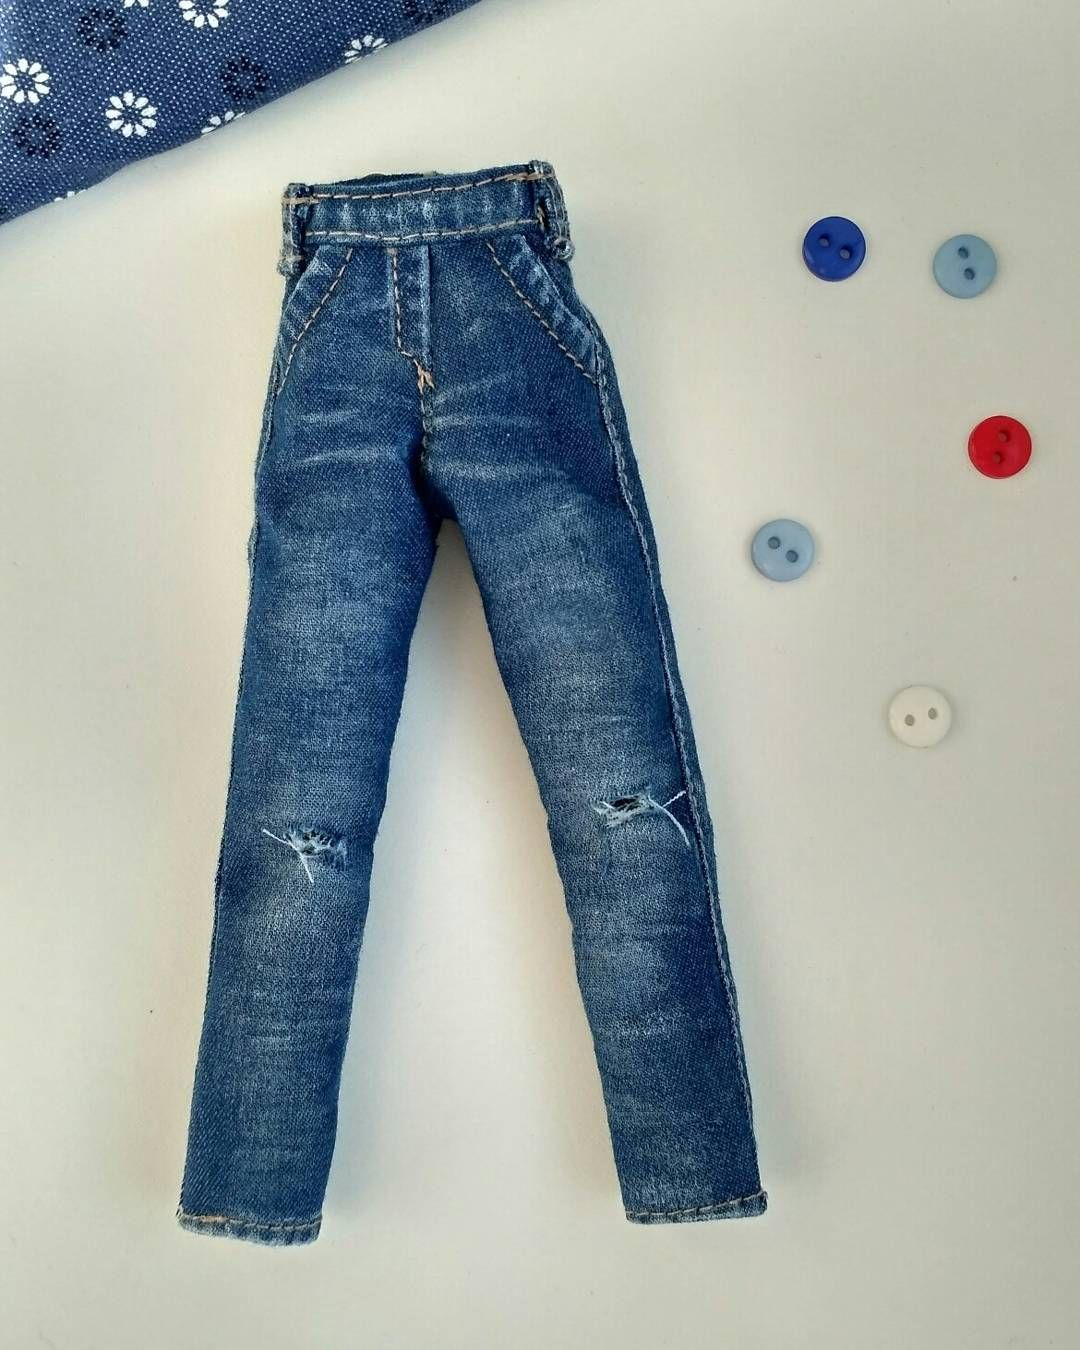 7e6d6bf62 Джинсы. 850р+почта  одеждадляблайз  одеждадлякукол  одежда   одеждадлякуколсвоимируками  blythe